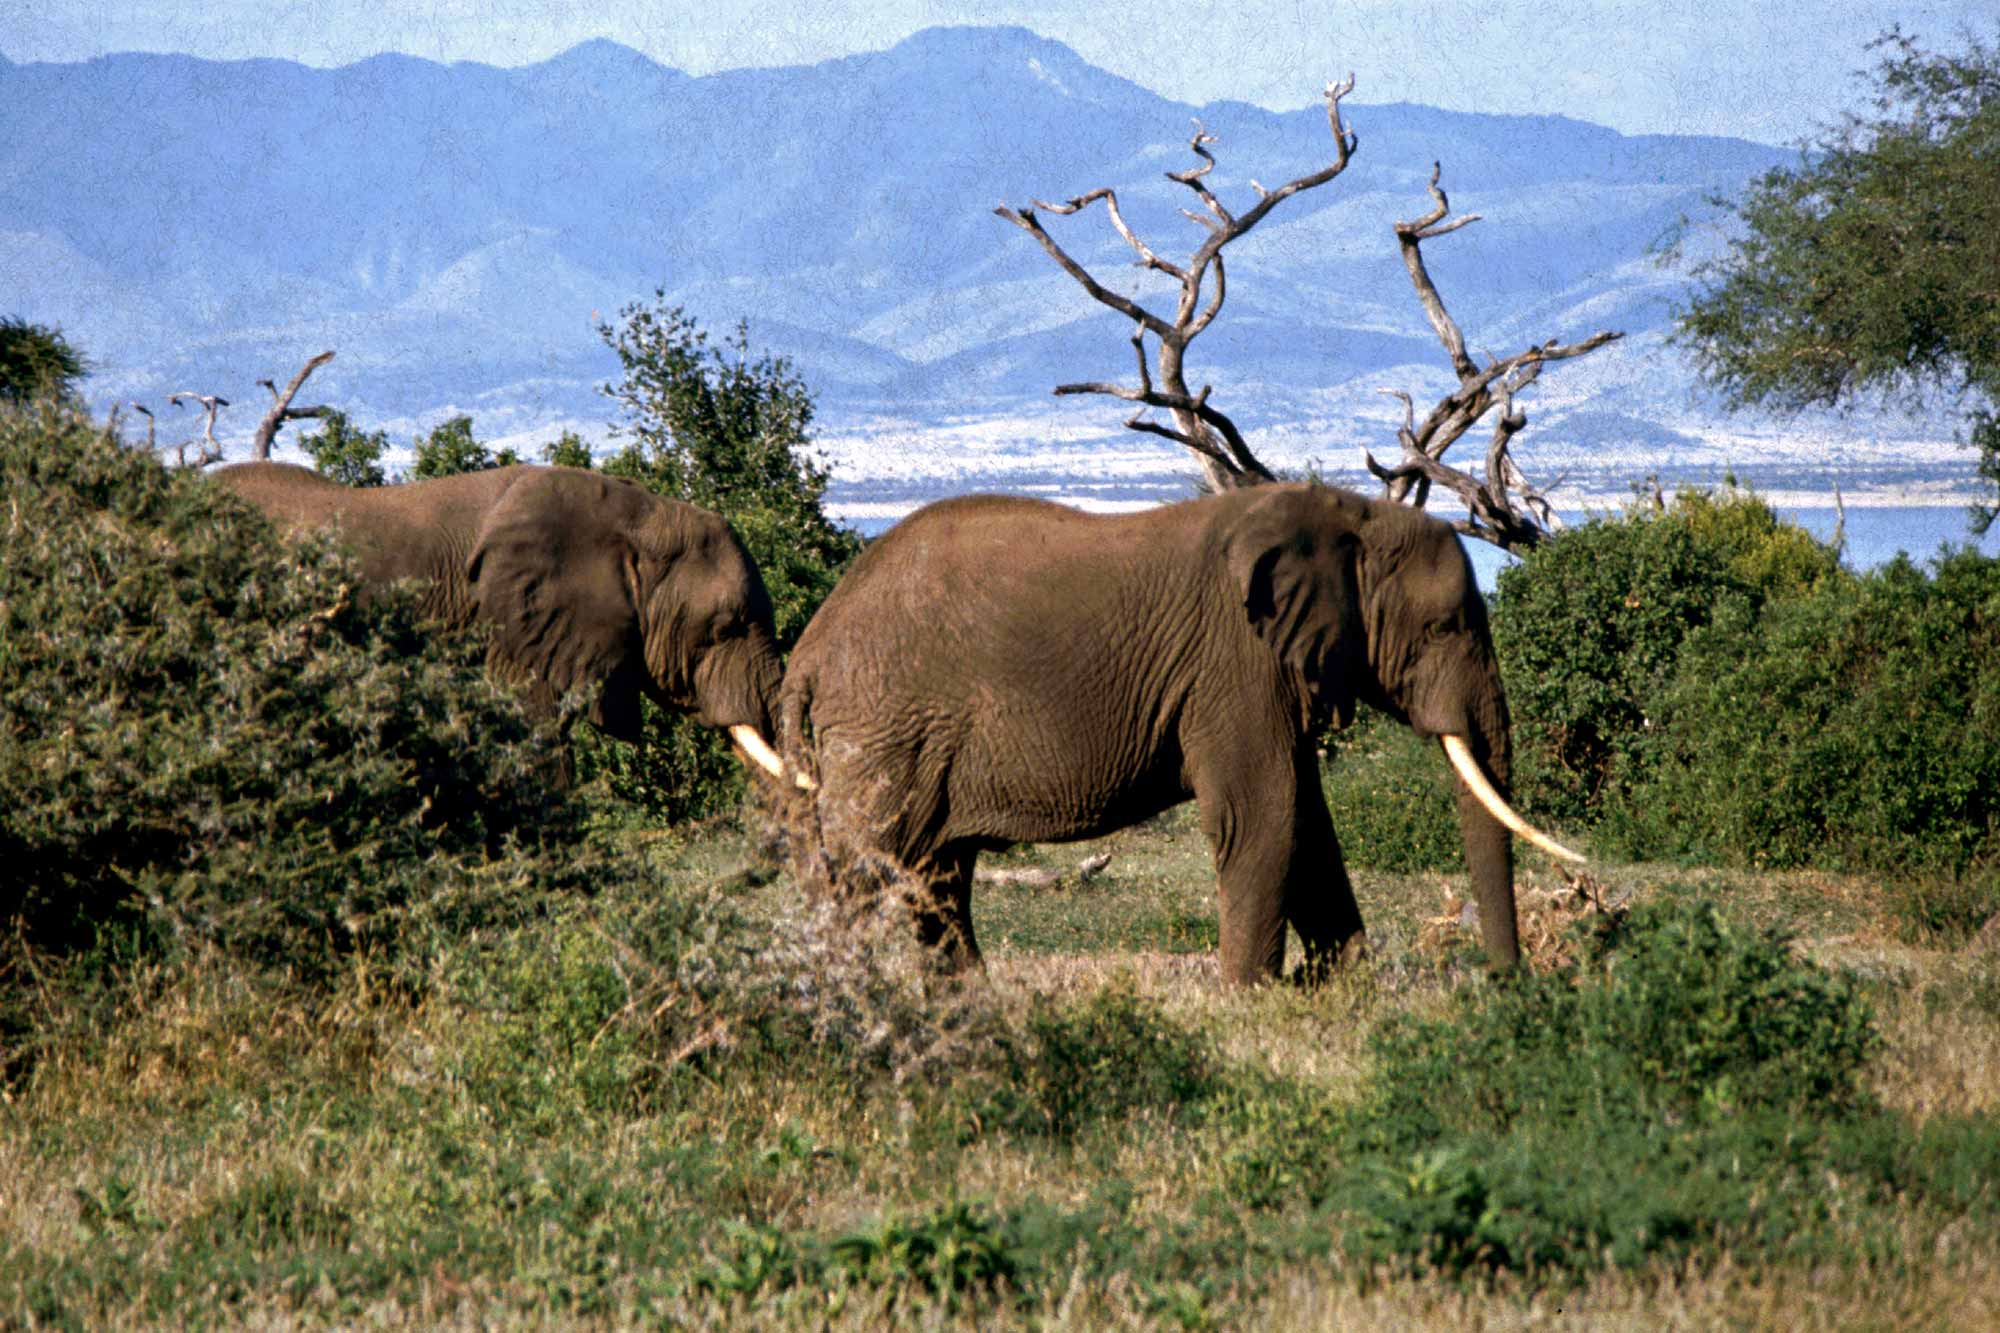 tanzania-lake-manyara-national-park-elephants-africa